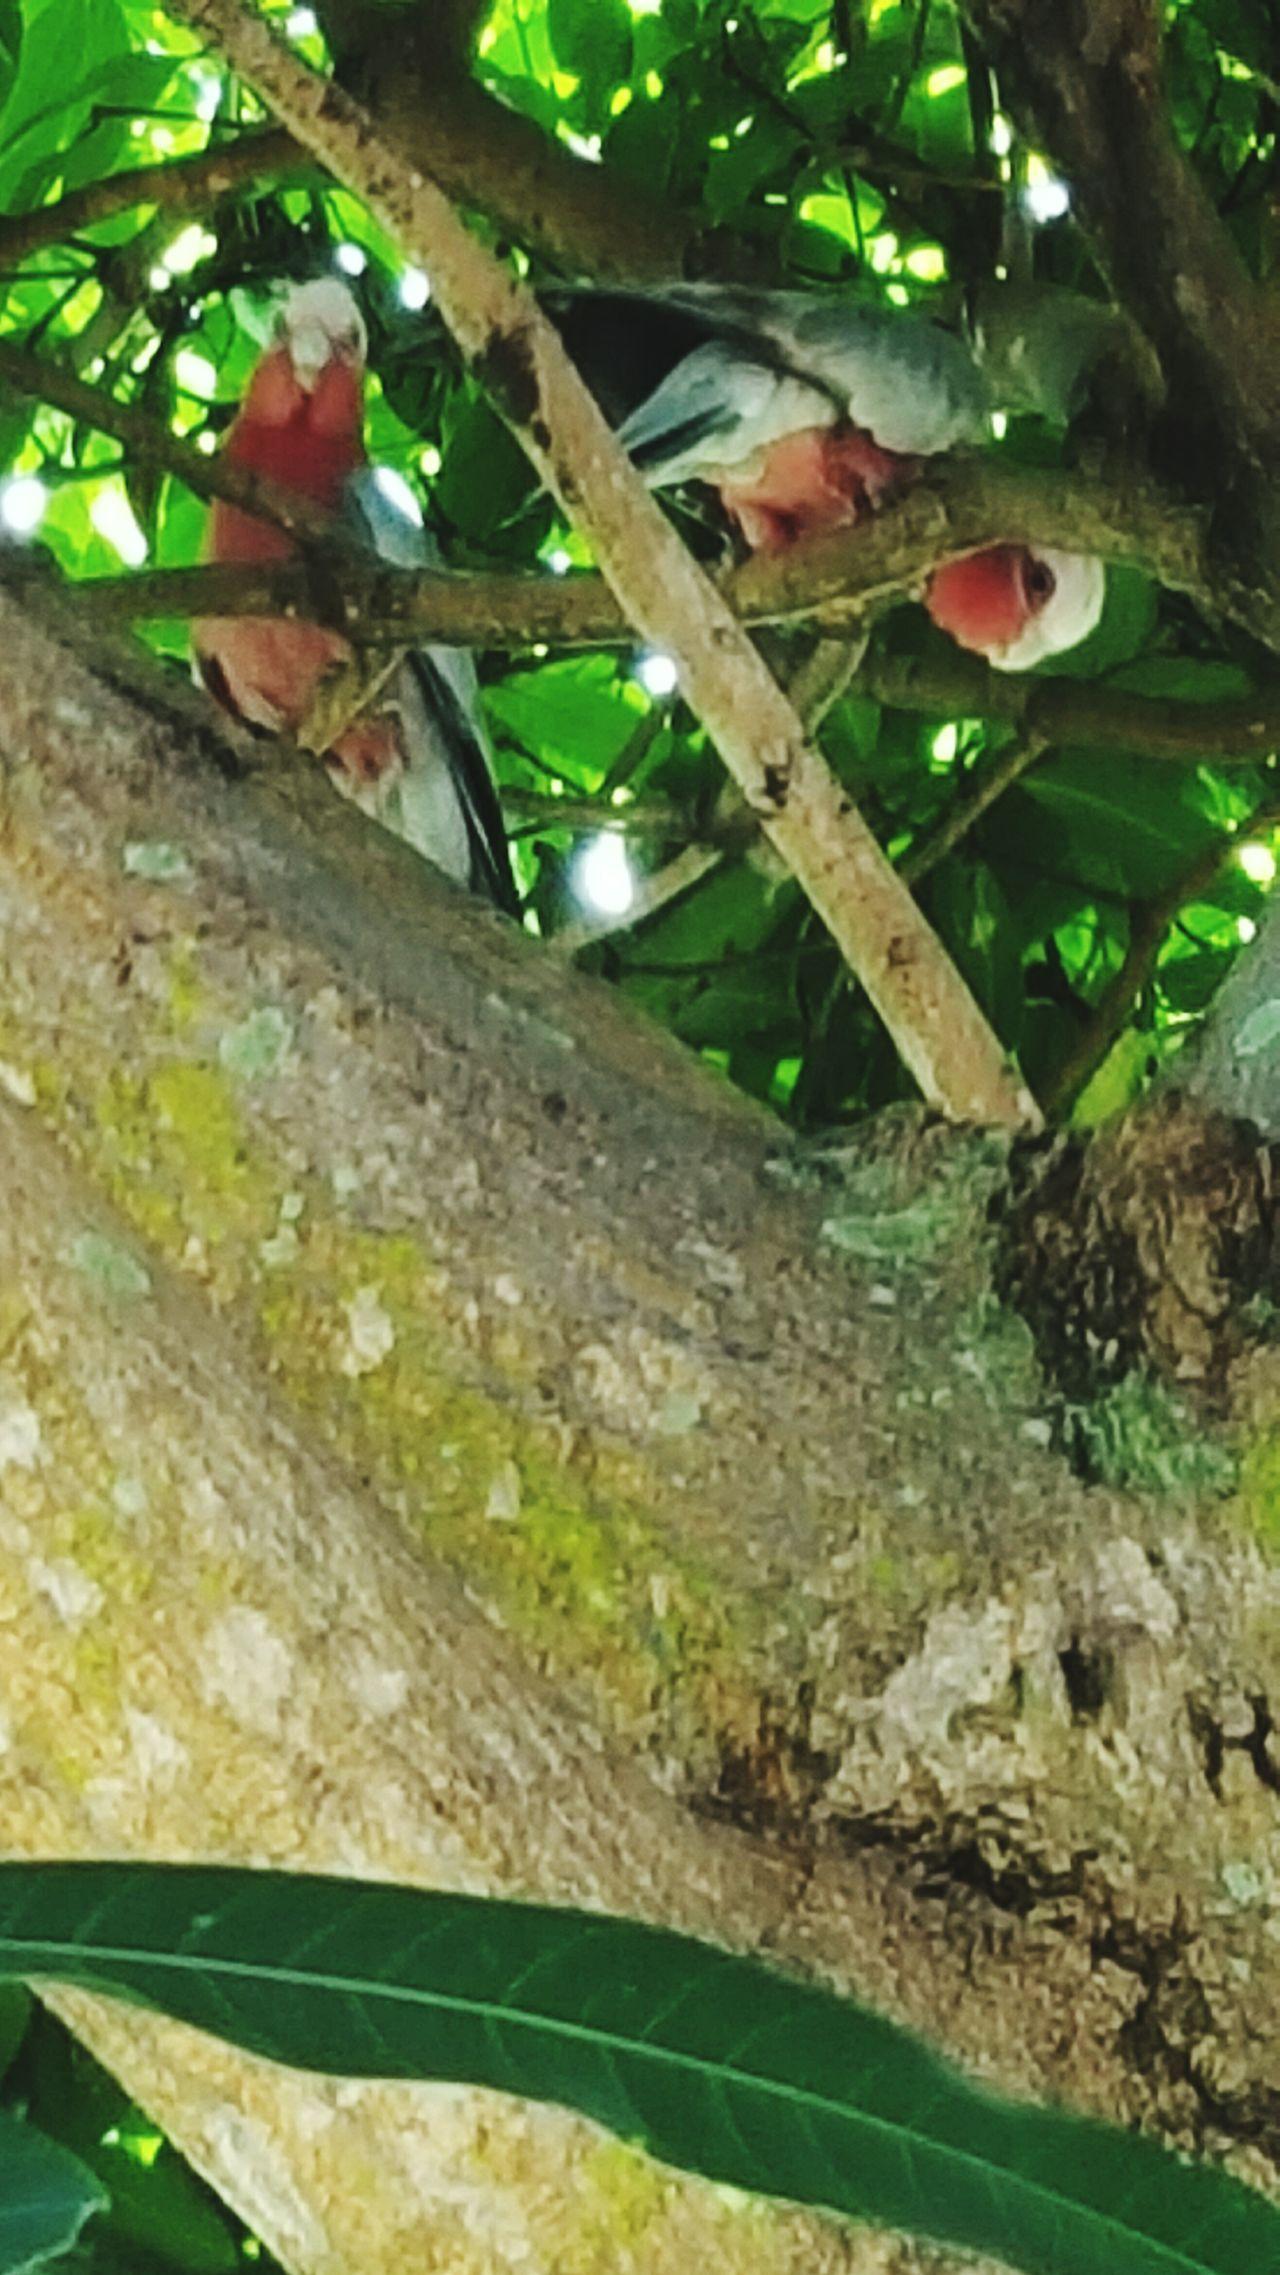 Birds Wildlife Birds🐦⛅ In Tree Birds_n_branches Animals No People 😇😇😇 Birds Looking At Me Taken Picture Enjoying Nature